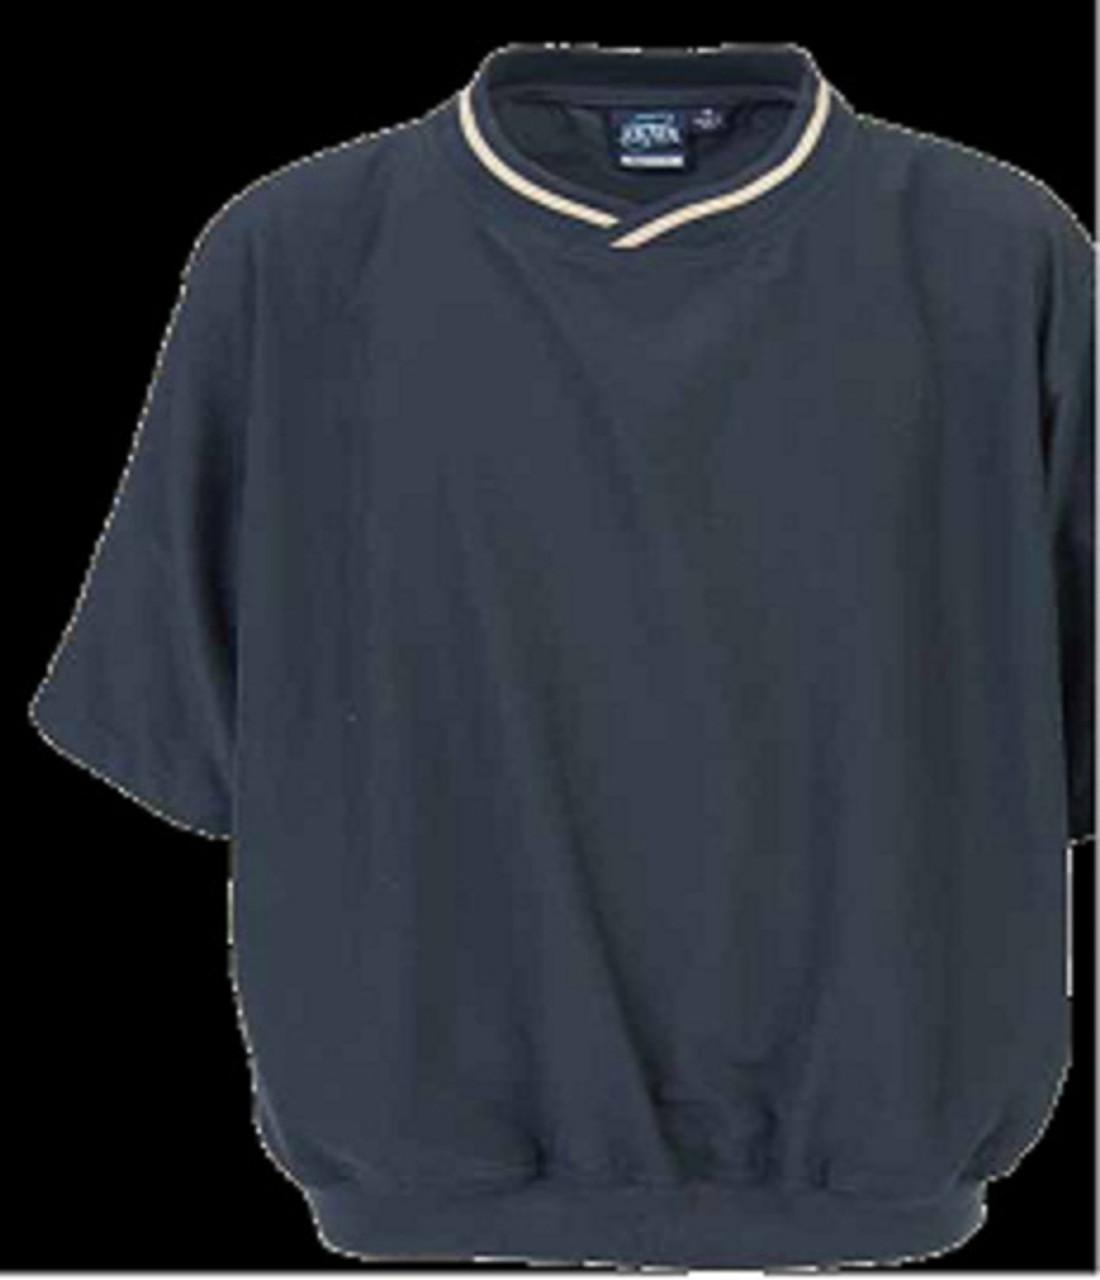 Akwa Mens Micro Fiber Crew Neck Shirt